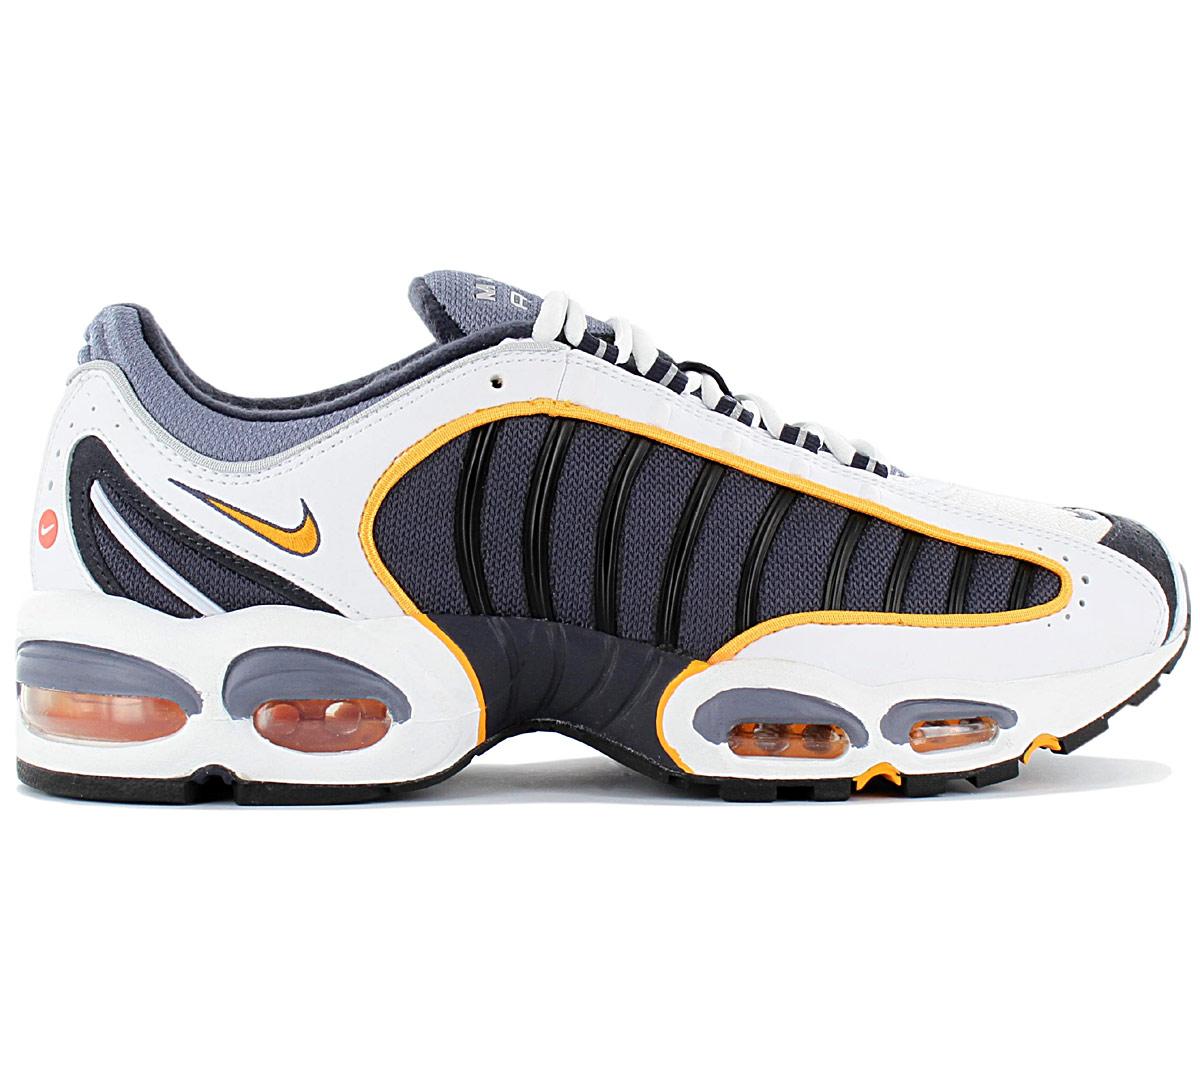 Détails sur Nike air max Tailwind IV Hommes Sneaker AQ2567 001 Loisirs Chaussures Neuf